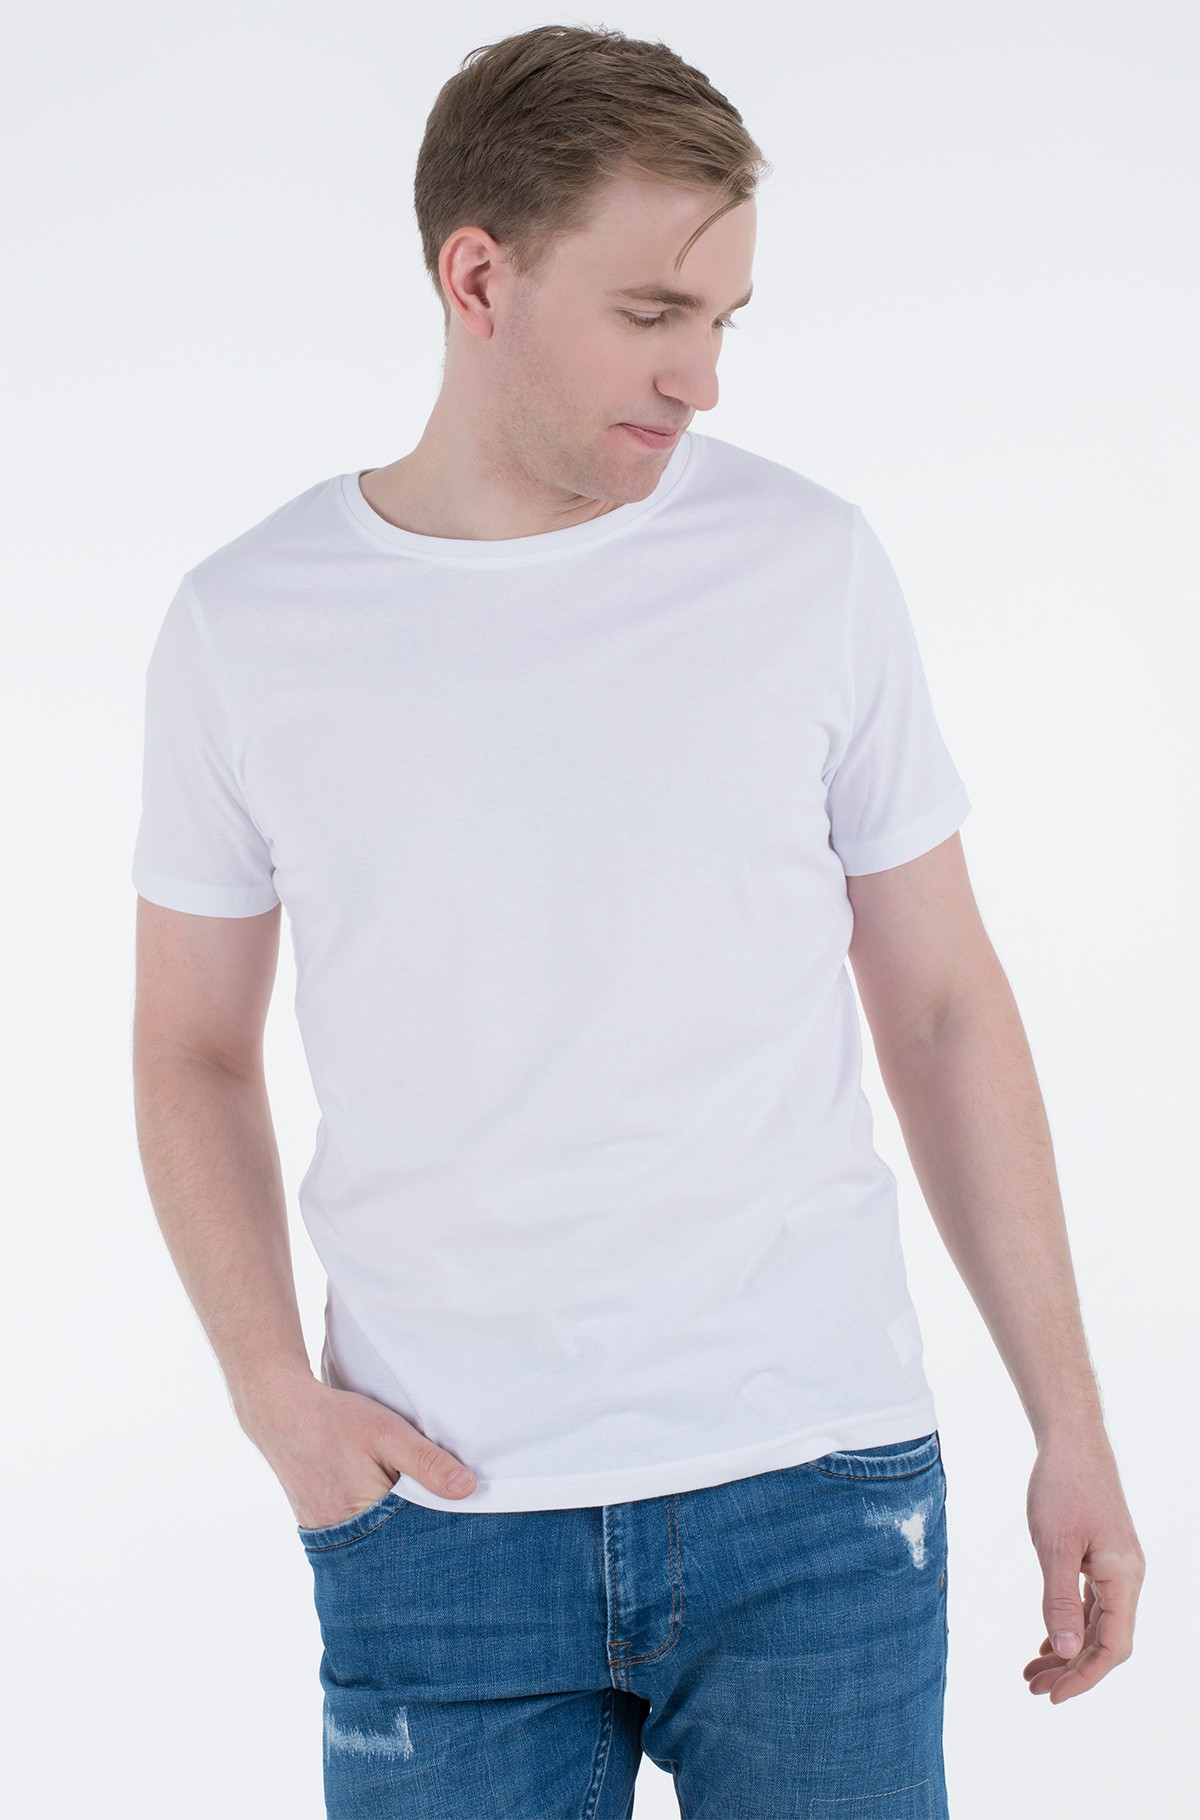 Marškiniai 2 vnt.  400710/9A71-full-1